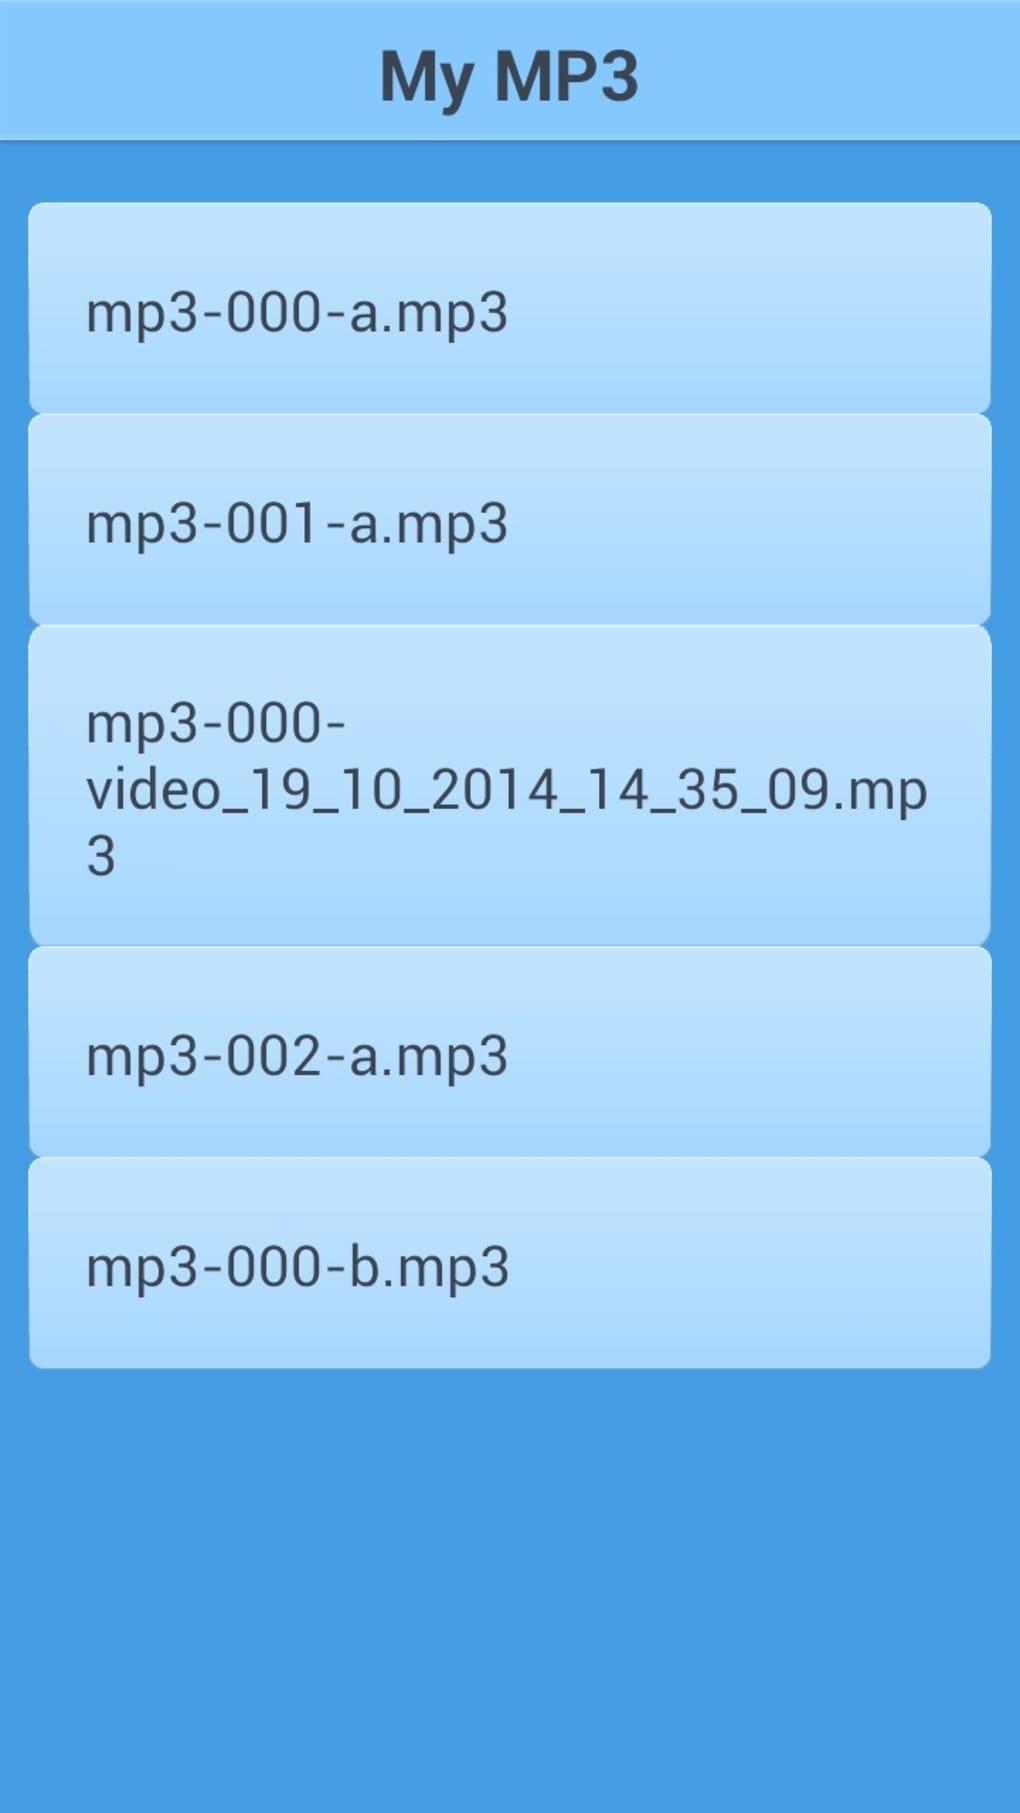 mp3000 free music downloads